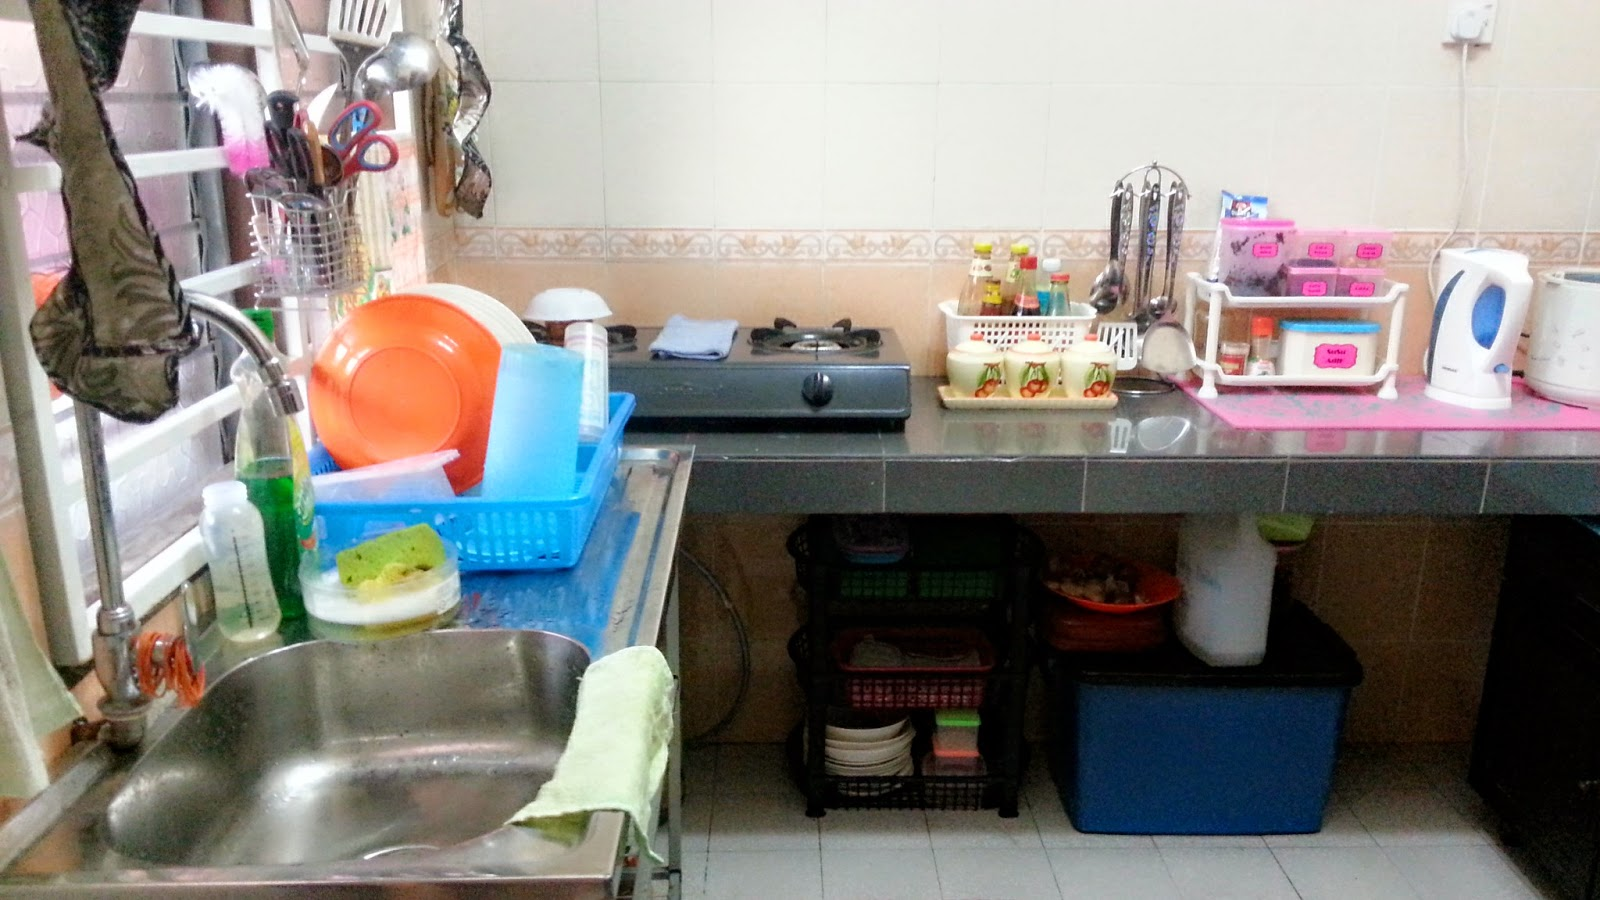 Ni Plak Pandangn Dari Ruang Makan Aku Sakit Mata Sebenarnyer Tengok Bawah Sinki Dengan Bahagian Tong Gas Tu Nampak Cam Bersepah Ajer Tak Pelah